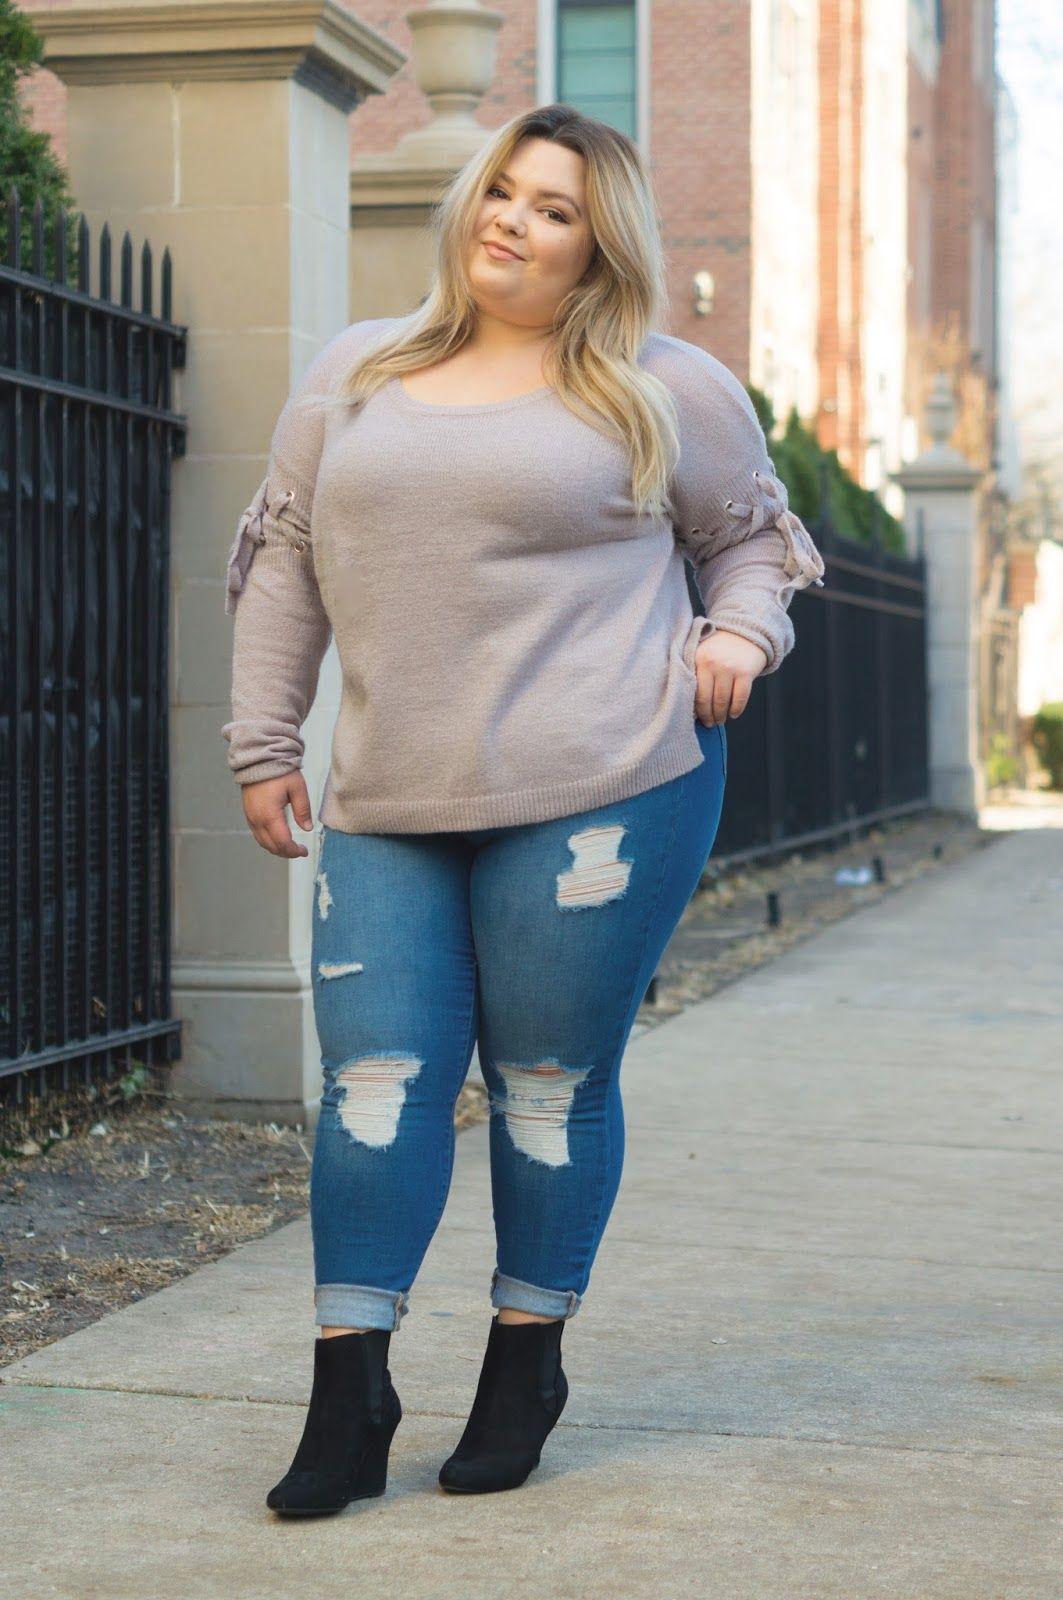 Congratulate, Plus size girls wearing skinny jeans